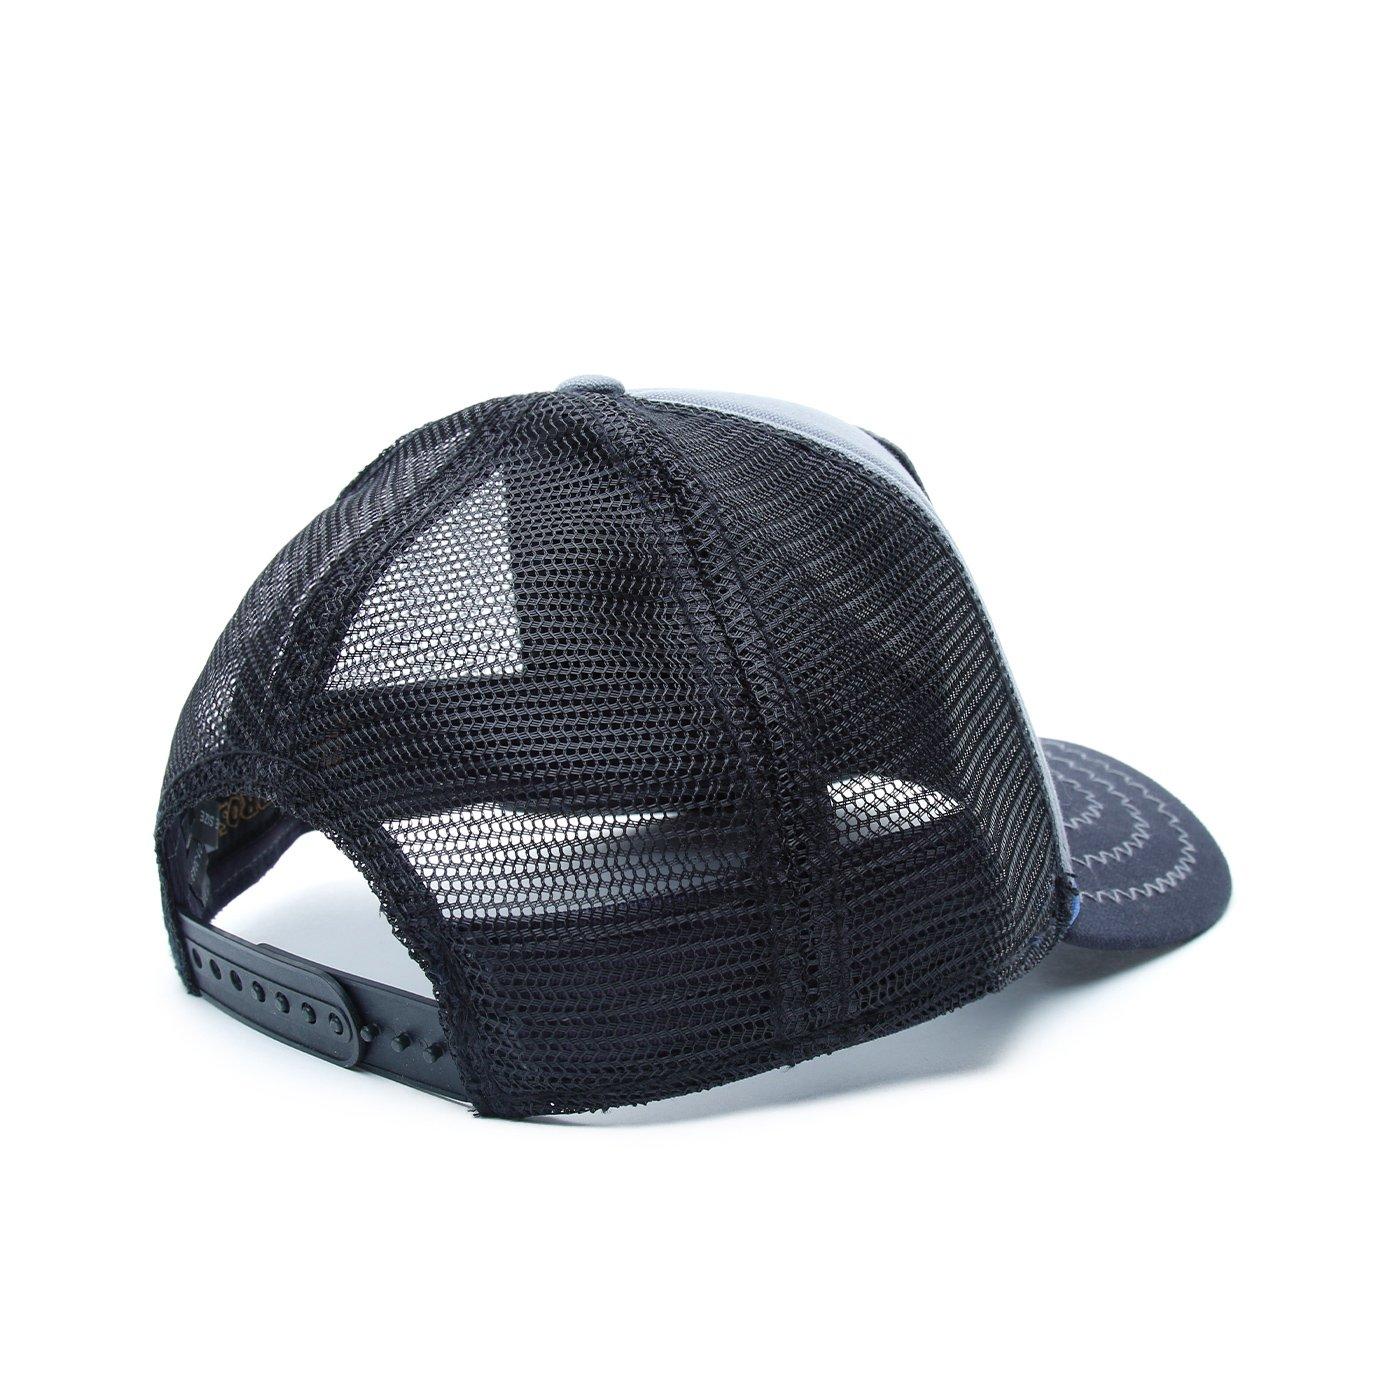 Gooring Bros Honeywell Unisex Mavi Şapka